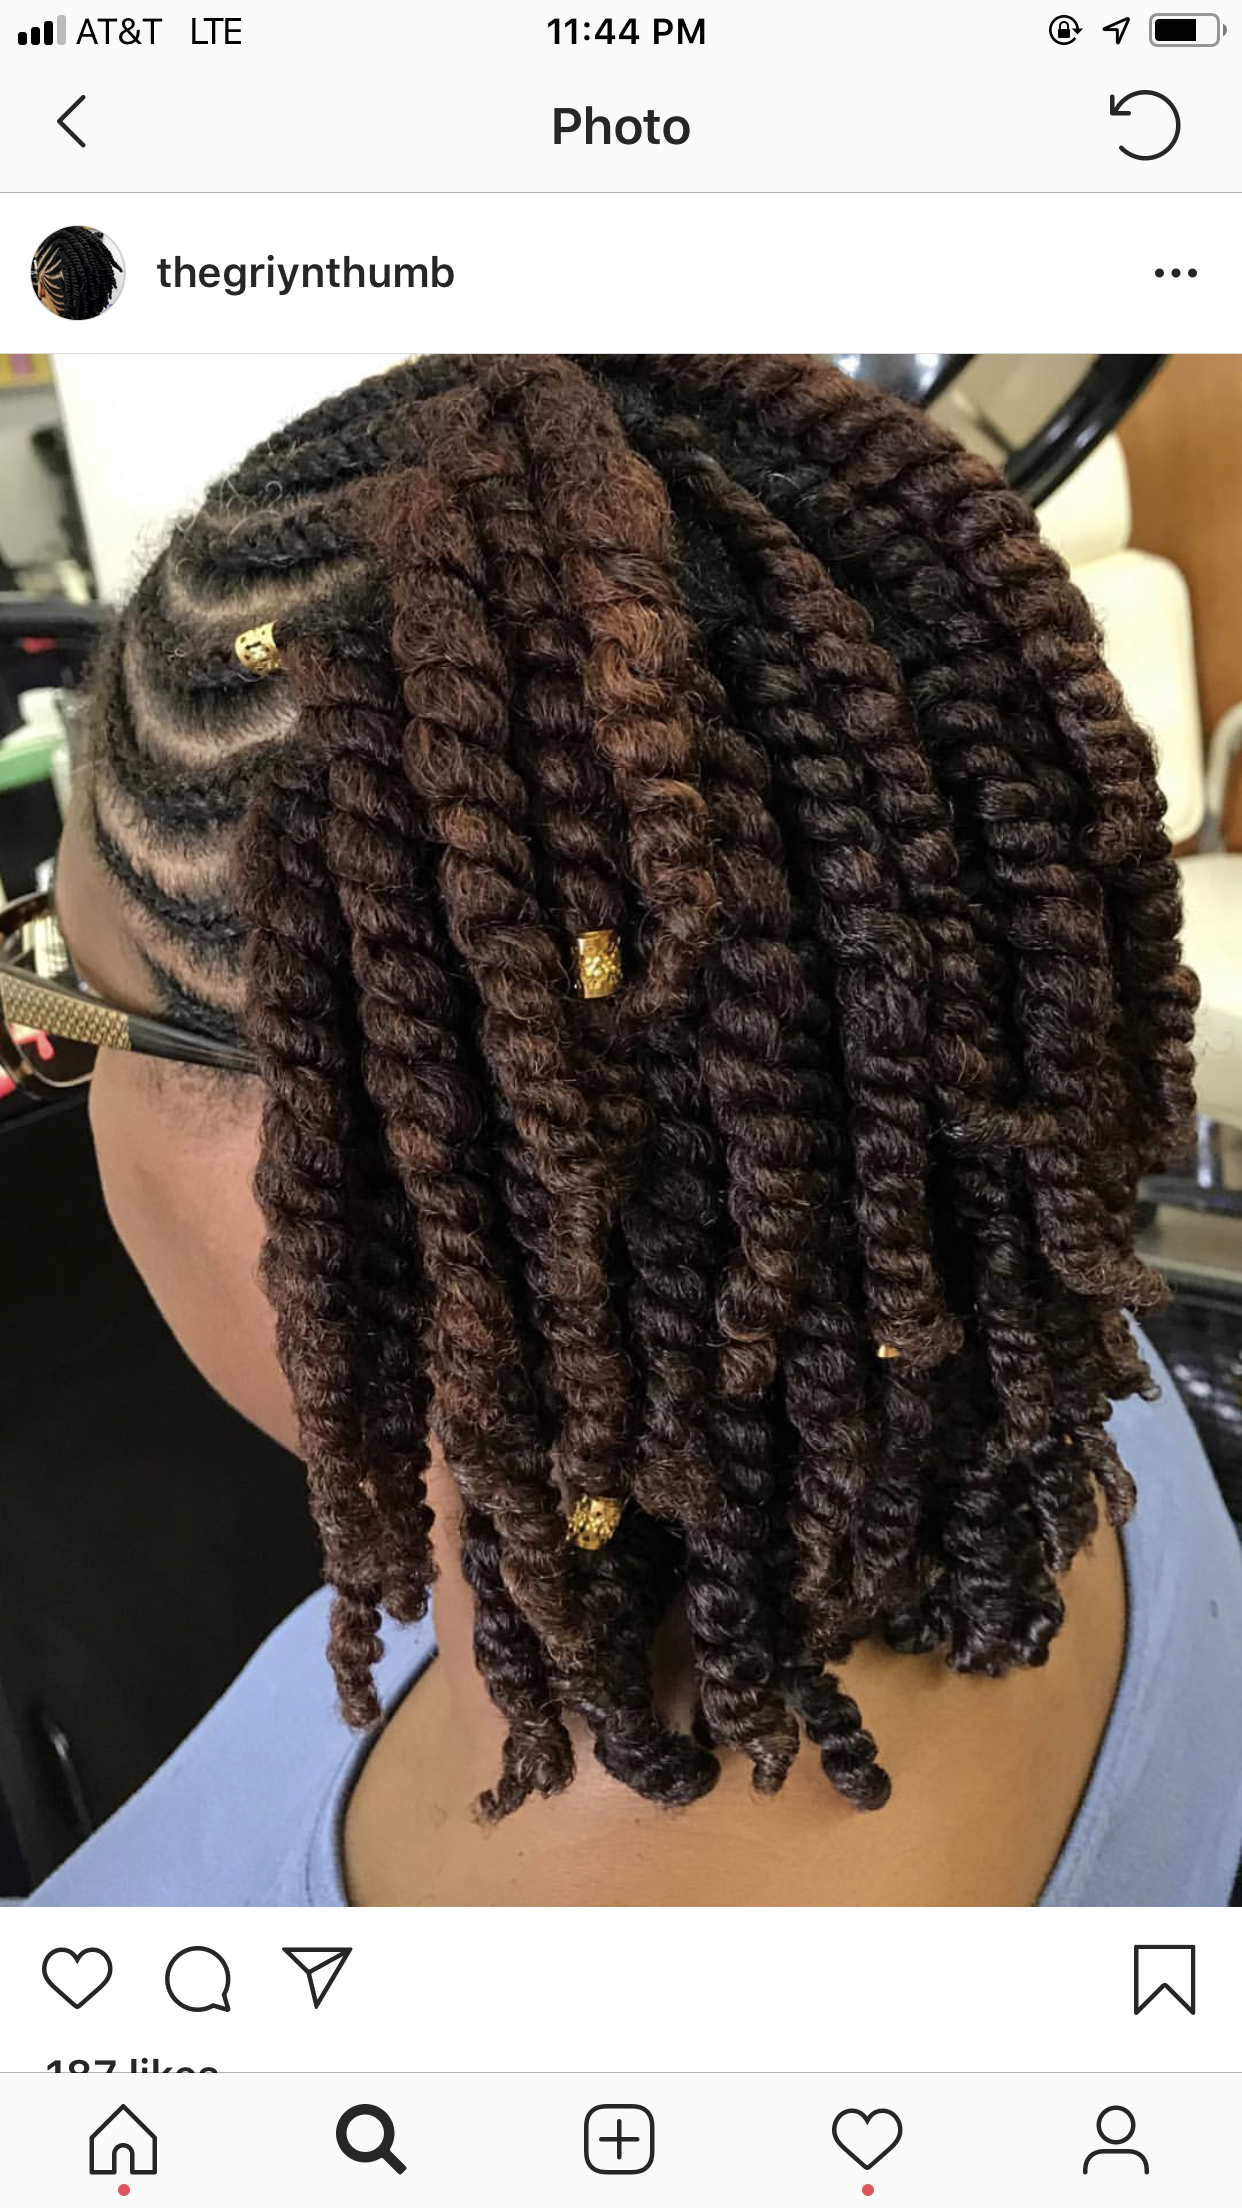 Pin By Erika Alexander On Erika S Natural Hair Styles Natural Hair Styles For Black Women Protective Hairstyles For Natural Hair Natural Hair Twists